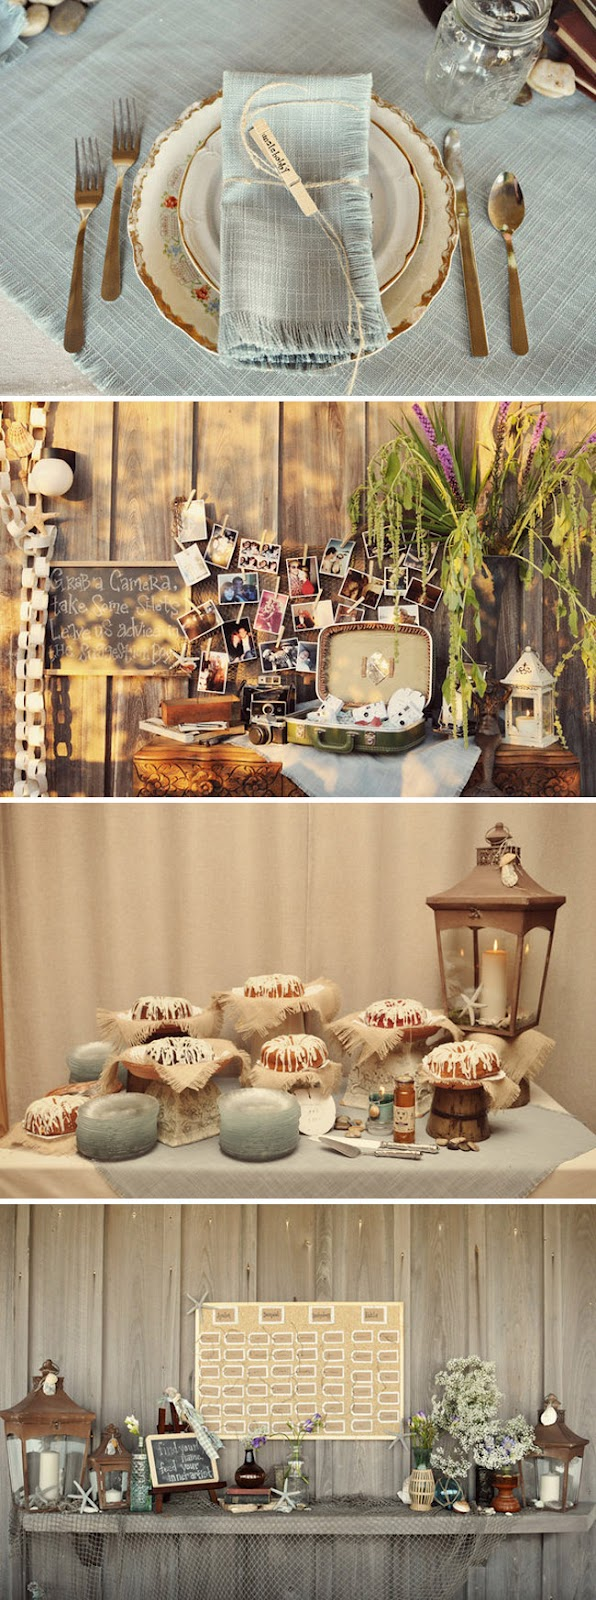 inspiración+para+decorar+boda+con+vajilla+vintage